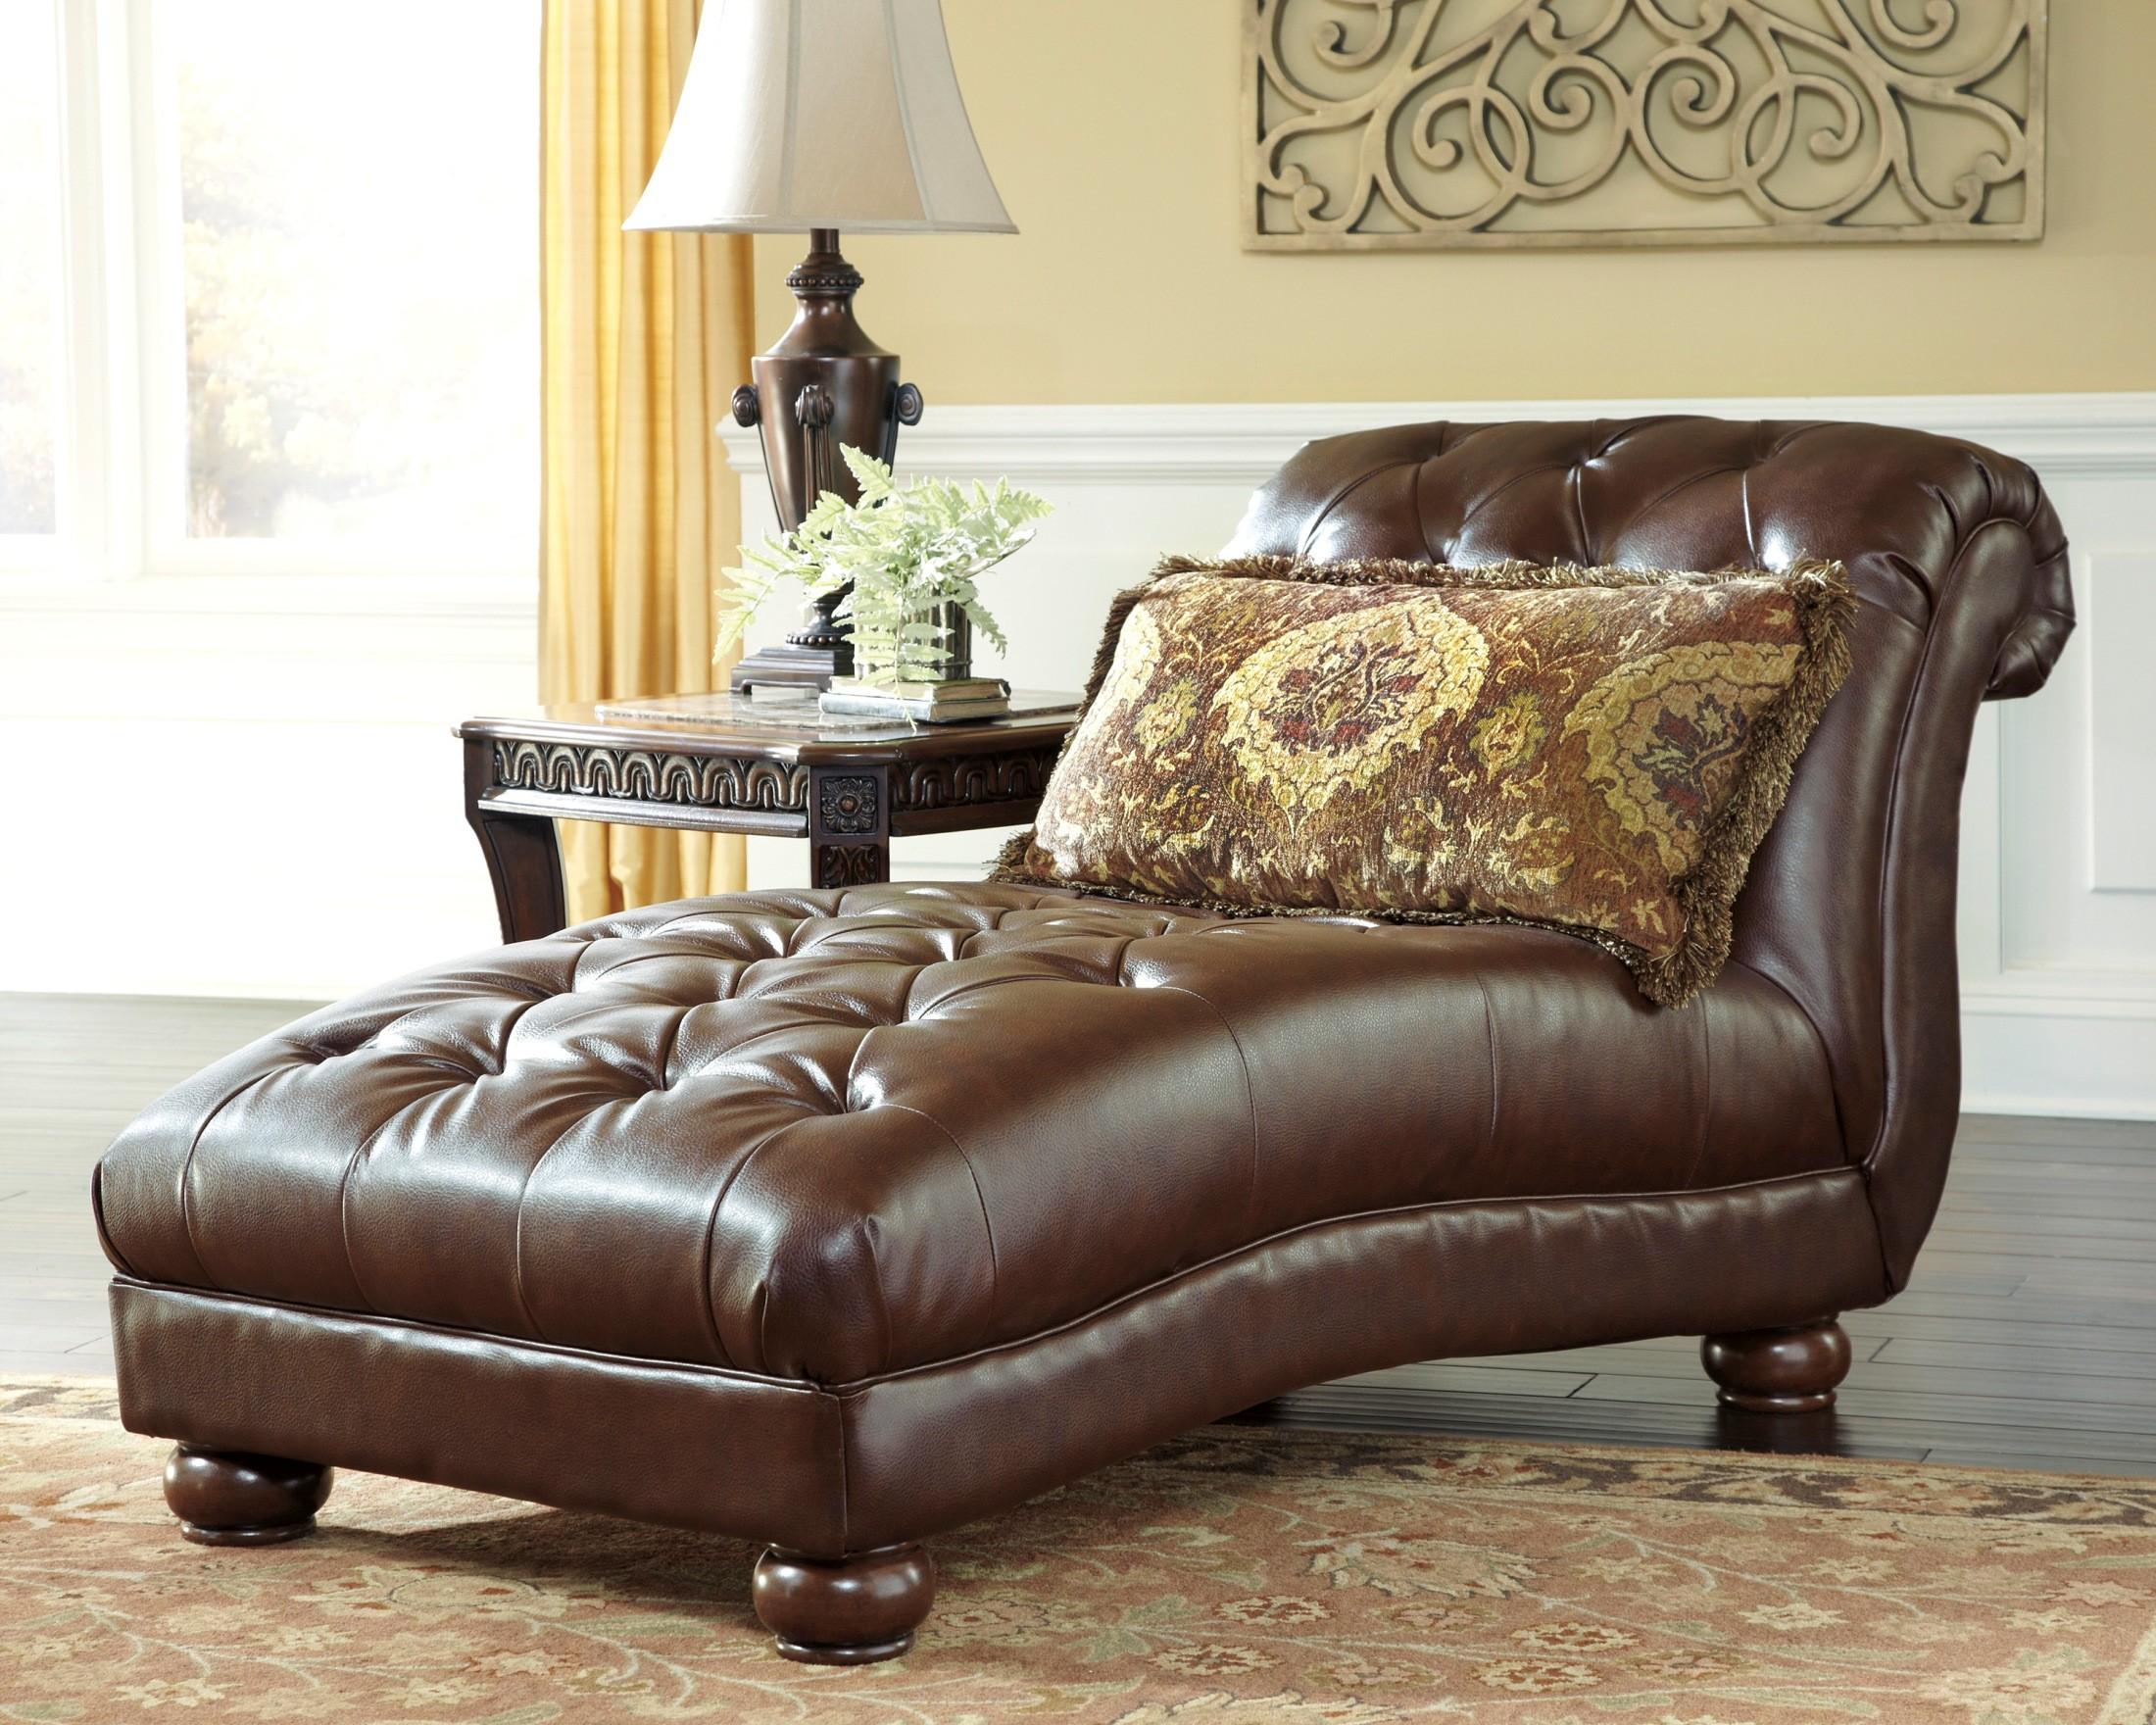 Beamerton heights chestnut chaise 3060515 ashley furniture for Ashley furniture chaise